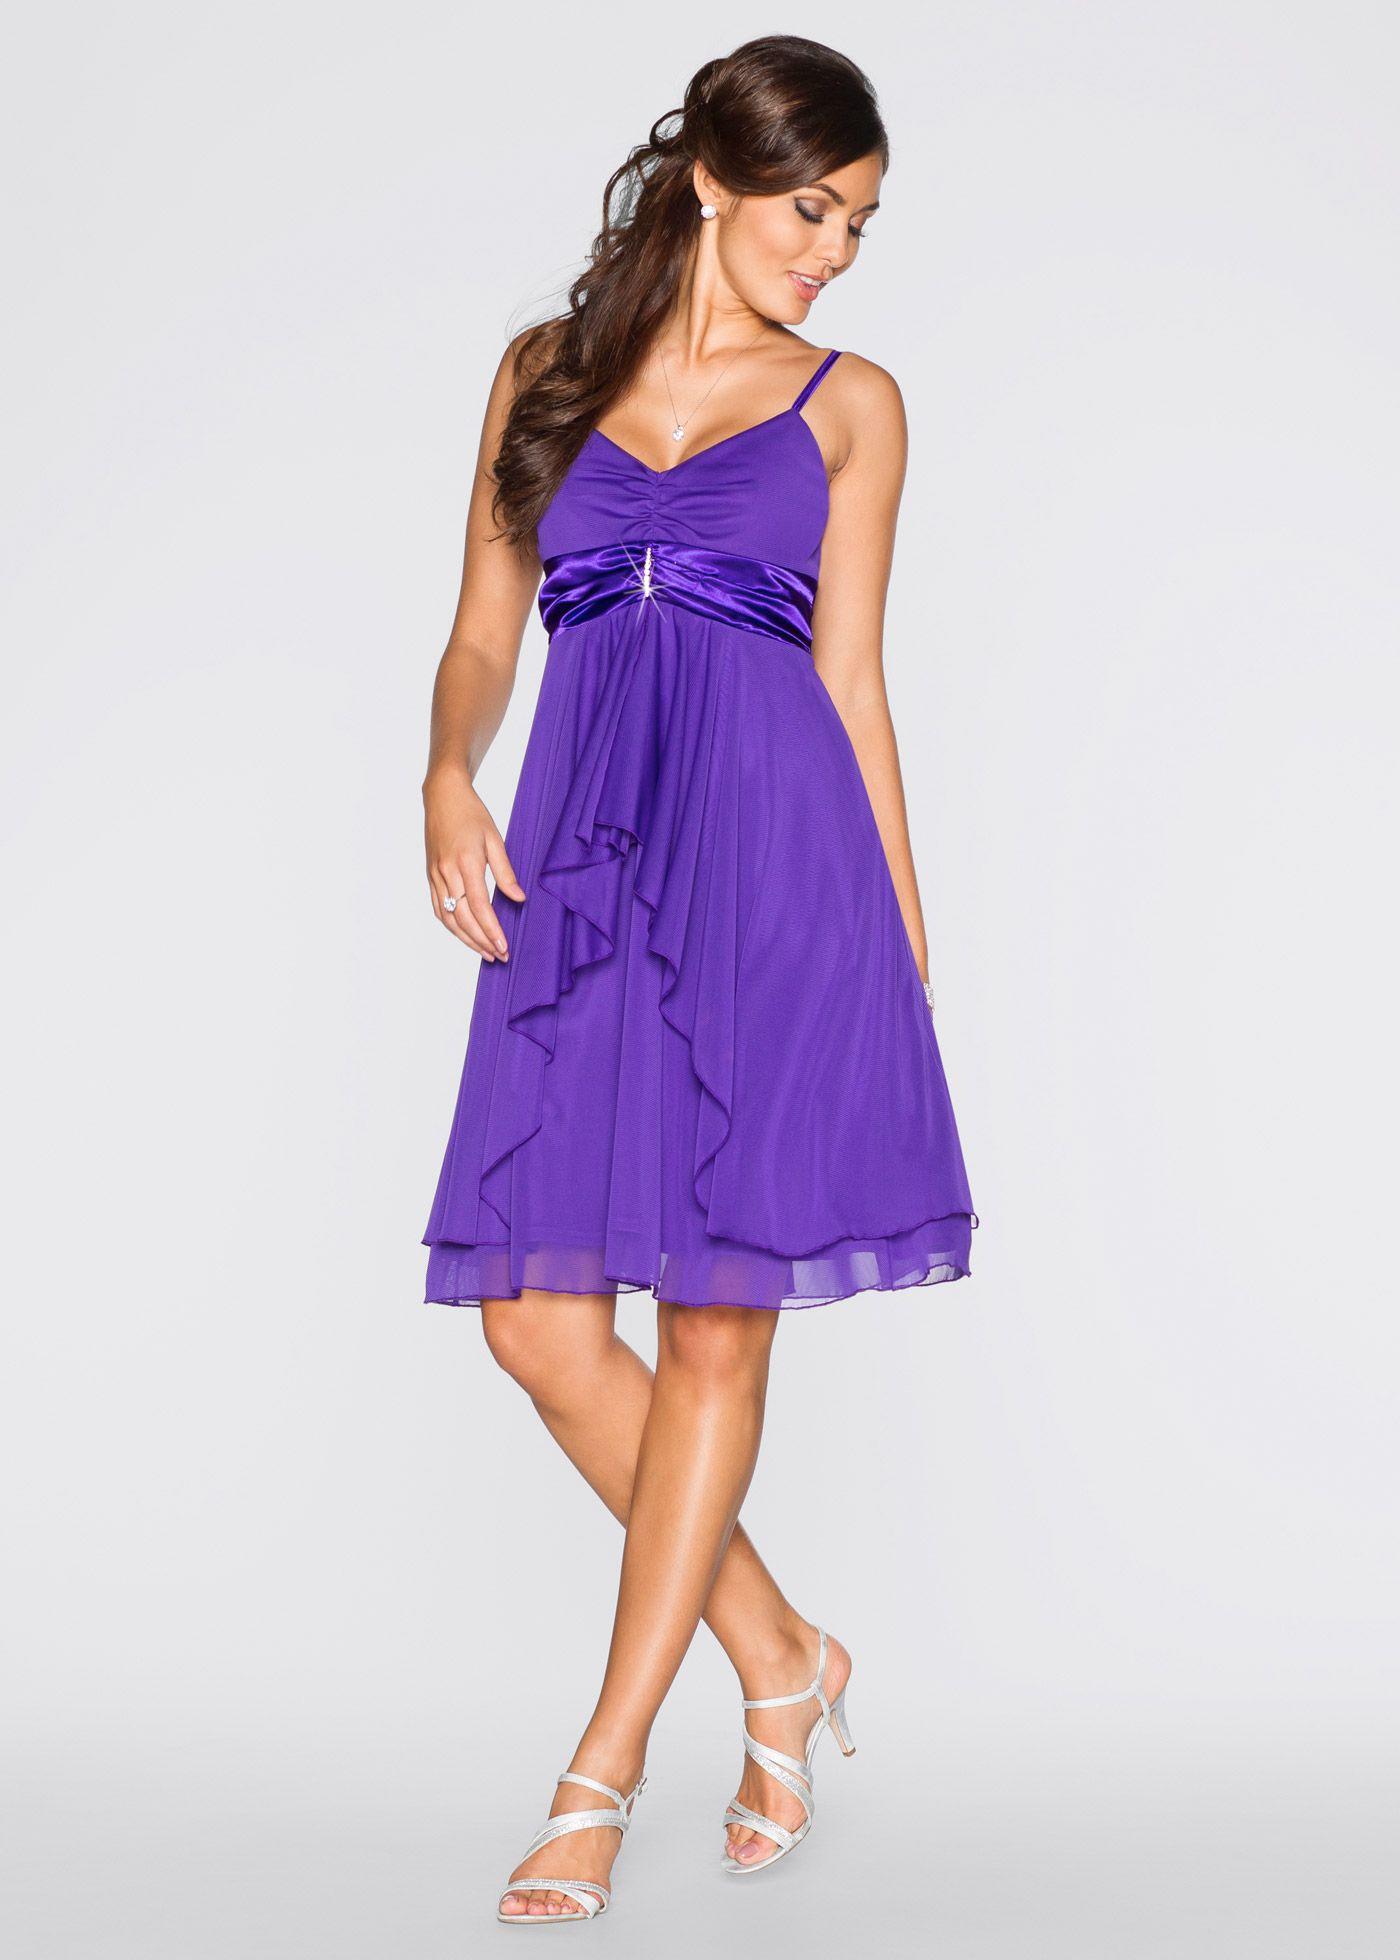 Abendkleid lila - BODYFLIRT jetzt im Online Shop von bonprix.de ab   32, 266b9c95ba